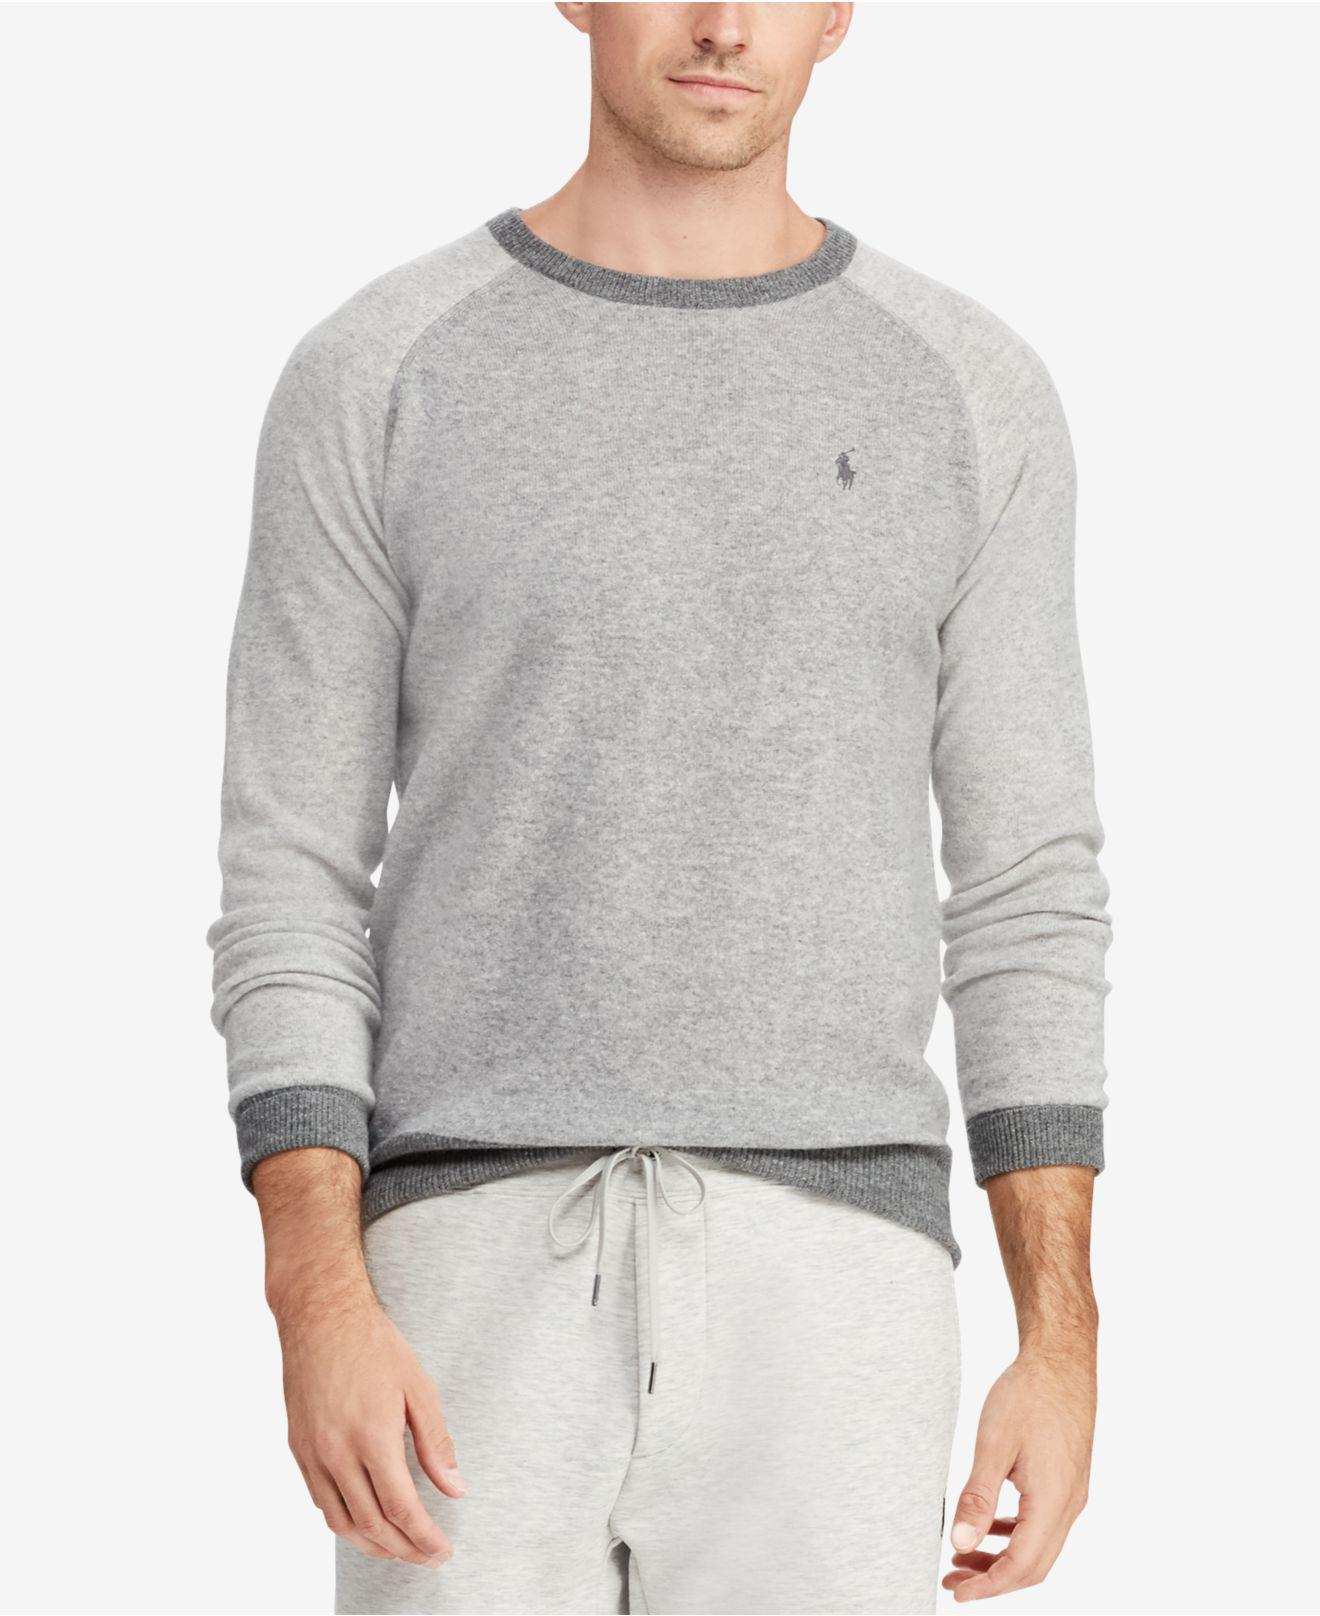 a4442d6e31a Lyst - Polo Ralph Lauren Cashmere Sweater in Gray for Men